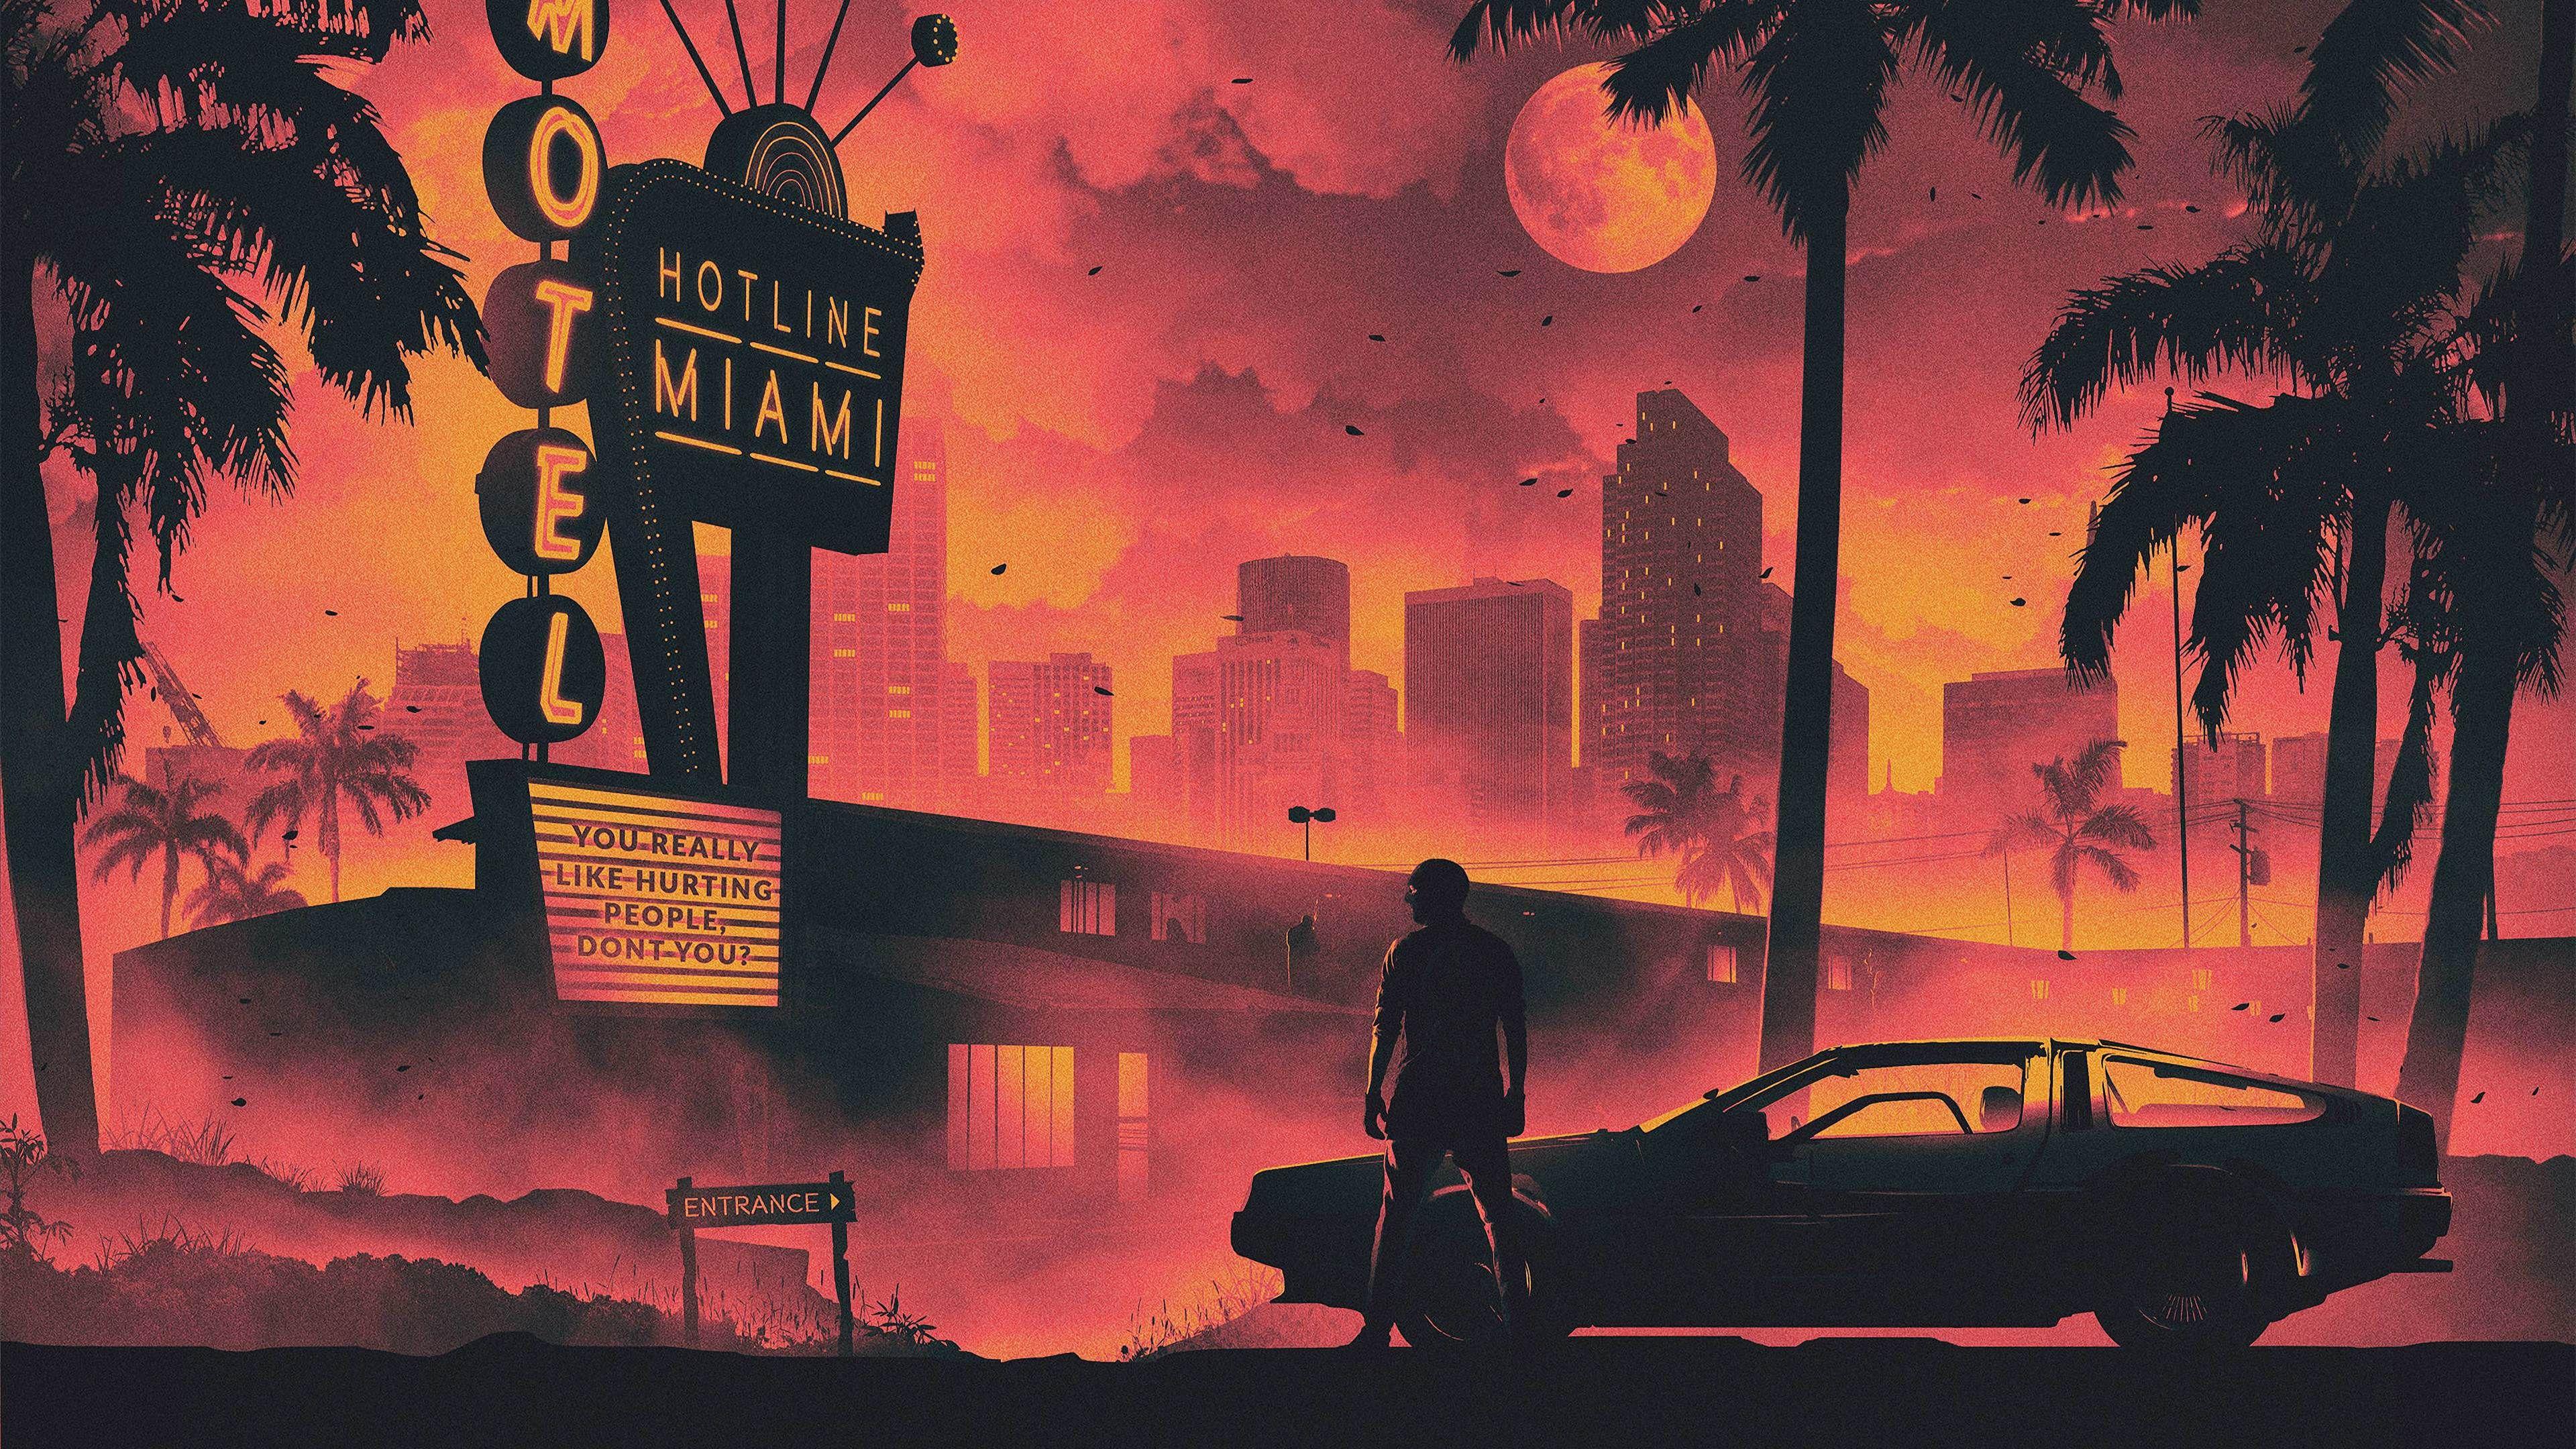 Hotline Miami Game Retro Style Dark Life Cityscape 5k Sunset Wallpapers Retro Wallpapers Miami Wallpapers Hotline Miami Wallpapers Hd Wal Cizim Arka Planlar